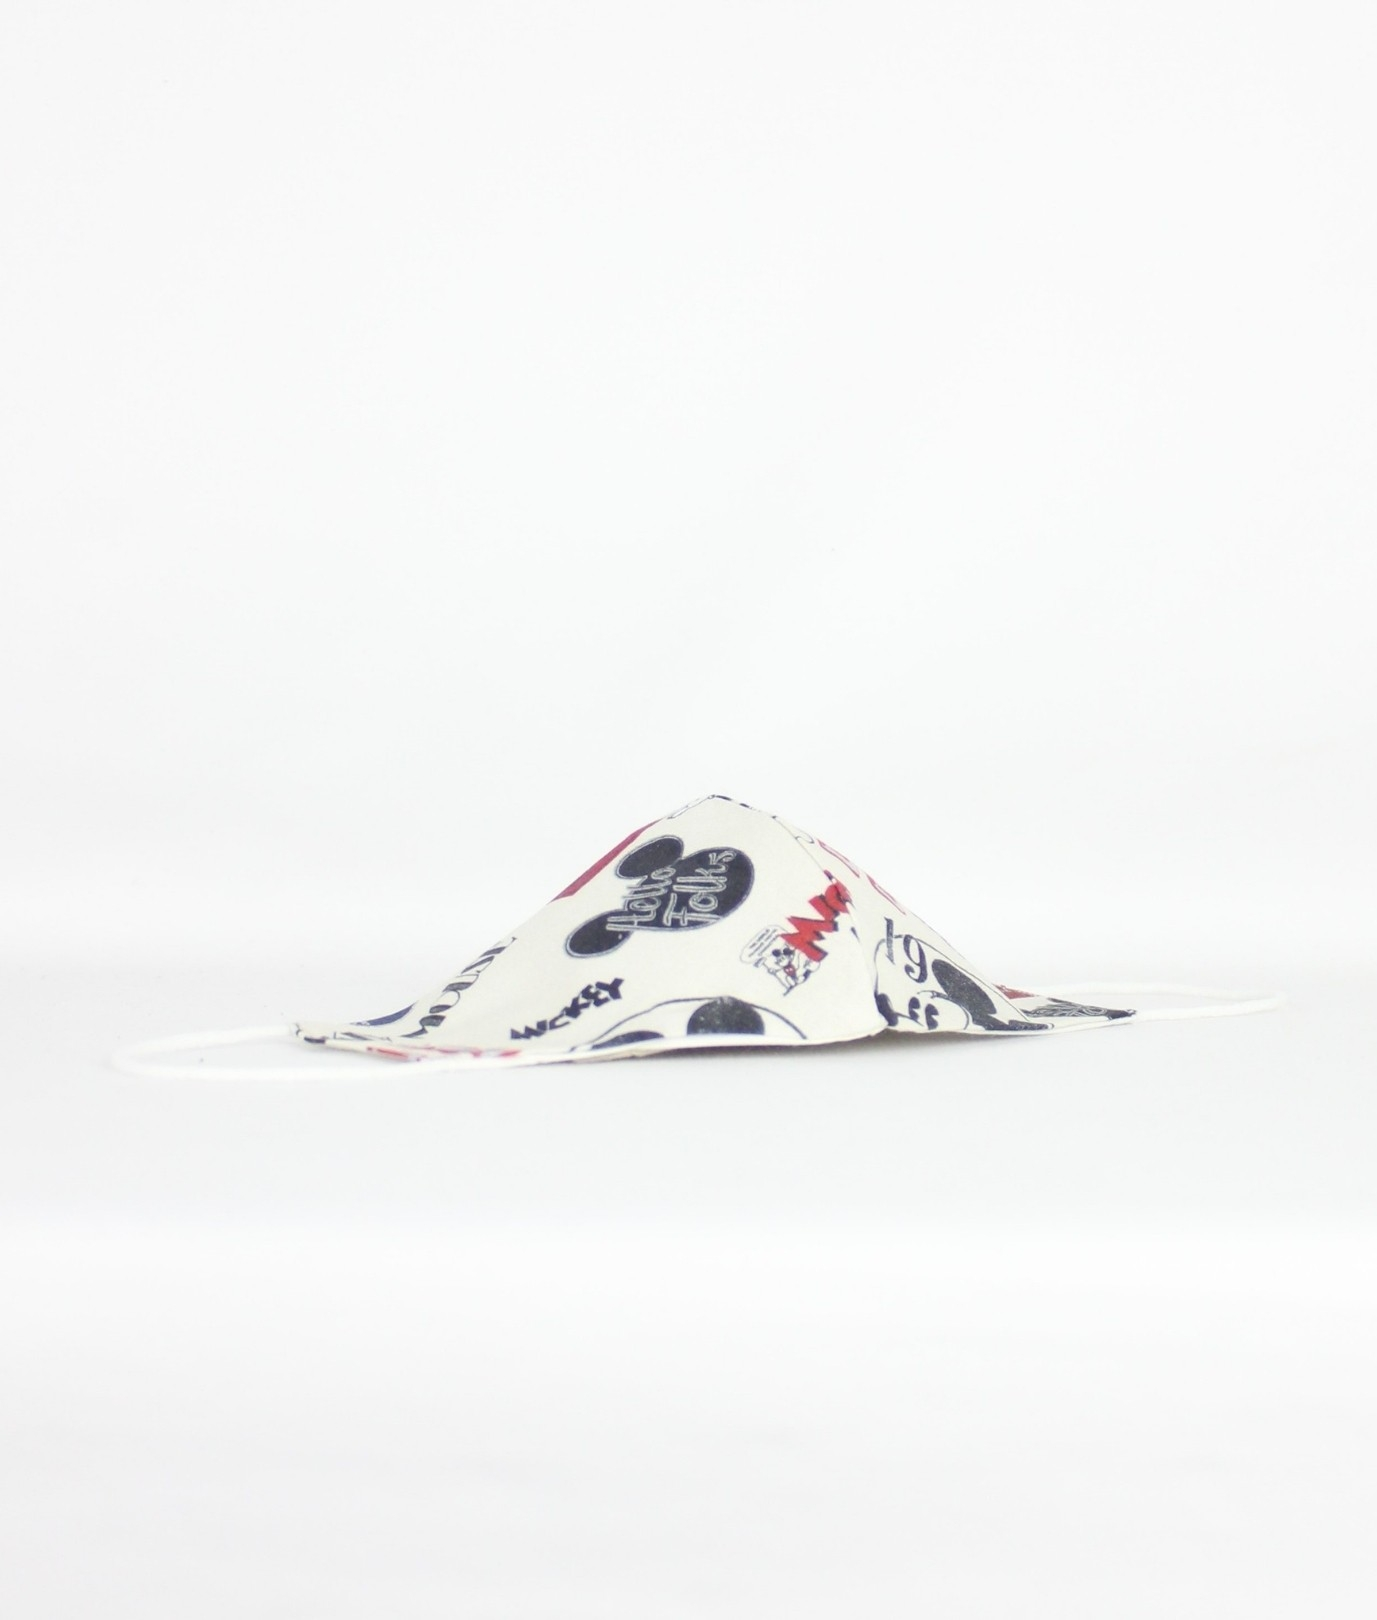 Mascara Yesitex - Infantil AS